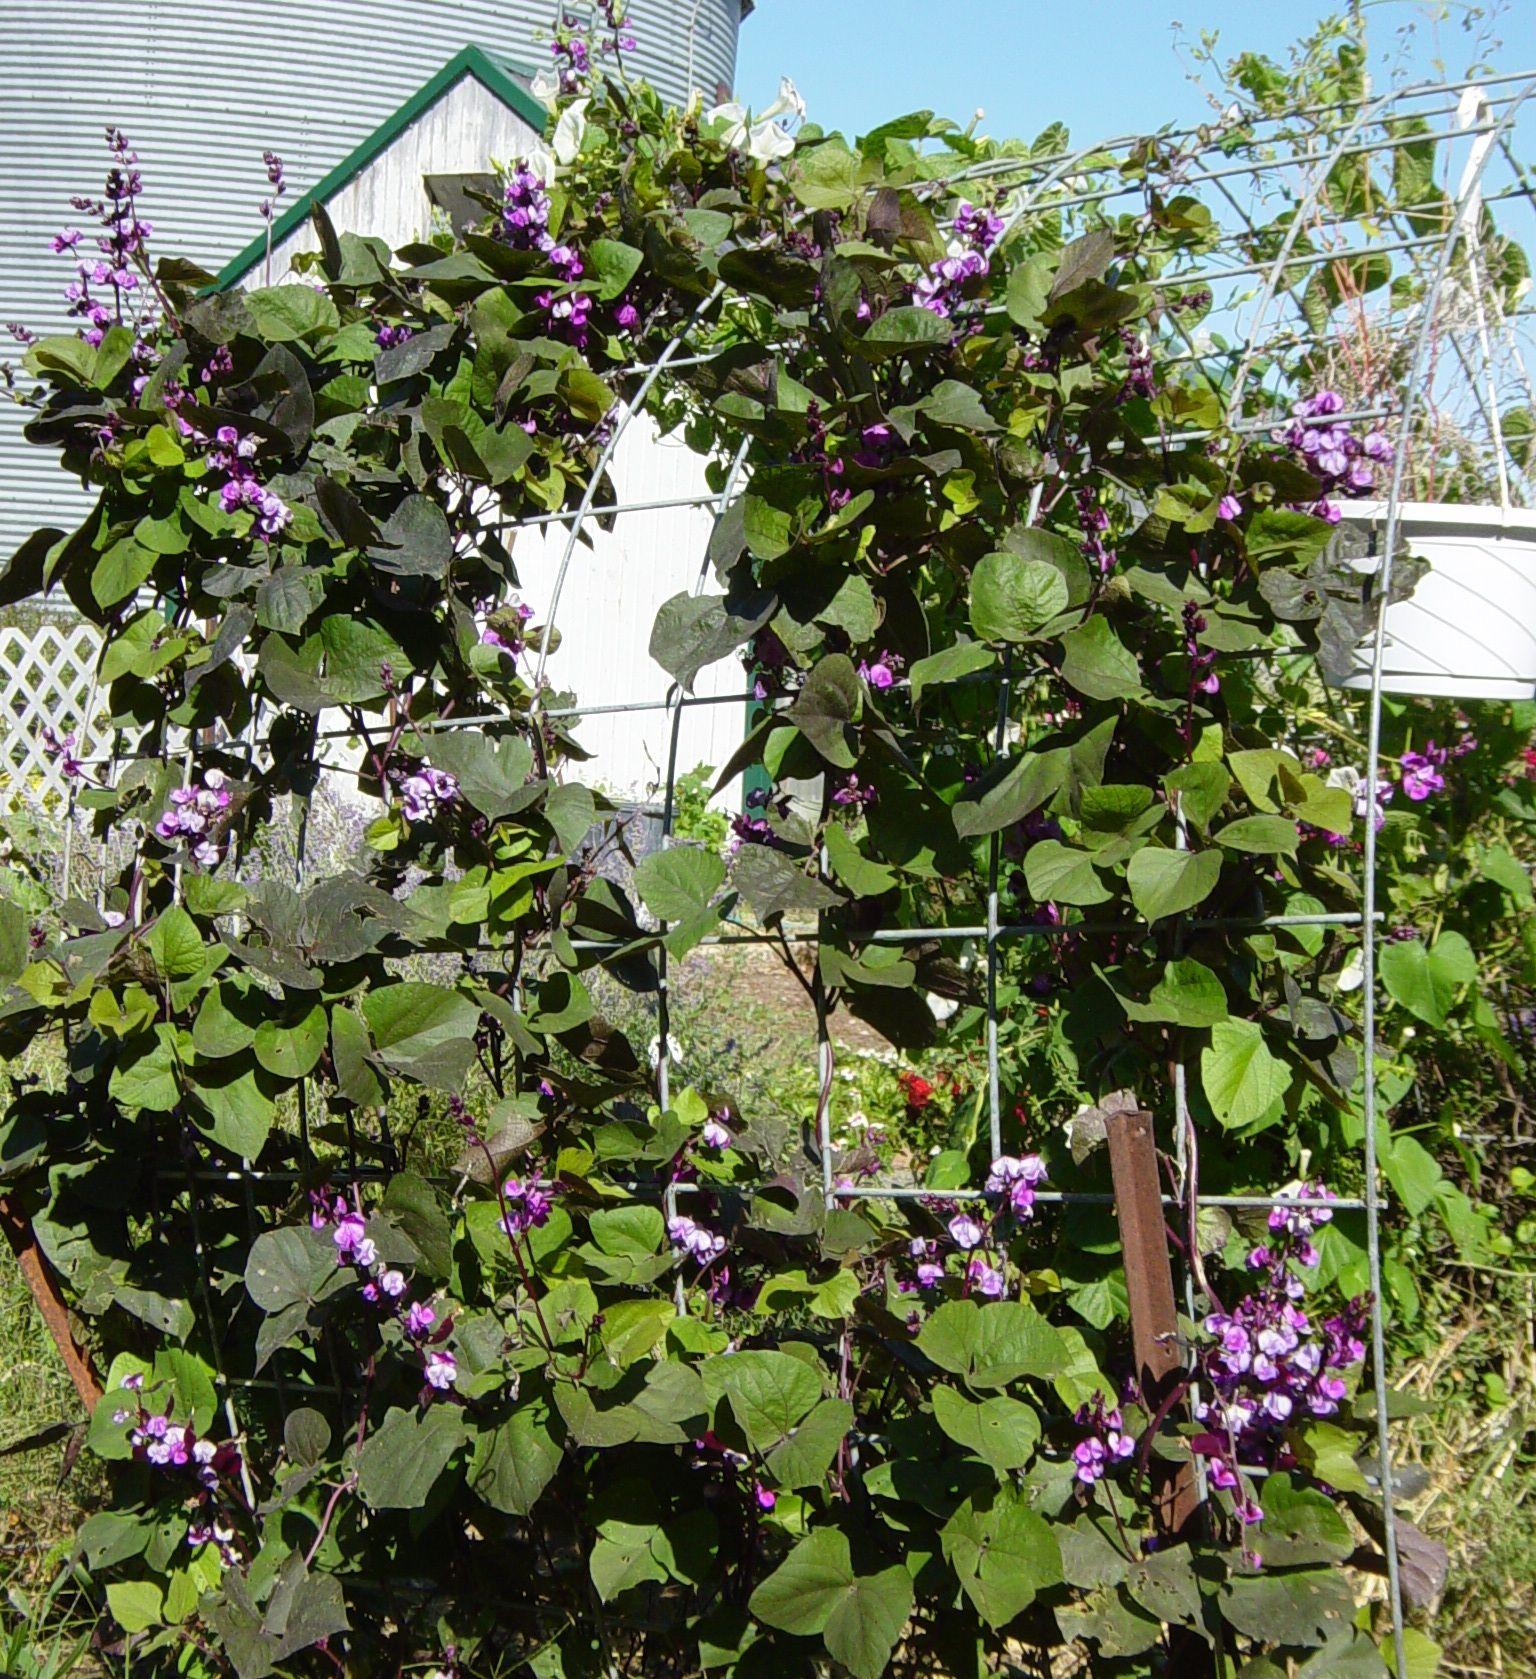 Purple Hyacinth Bean Vine Is A Vigorous Fast Growing Vine